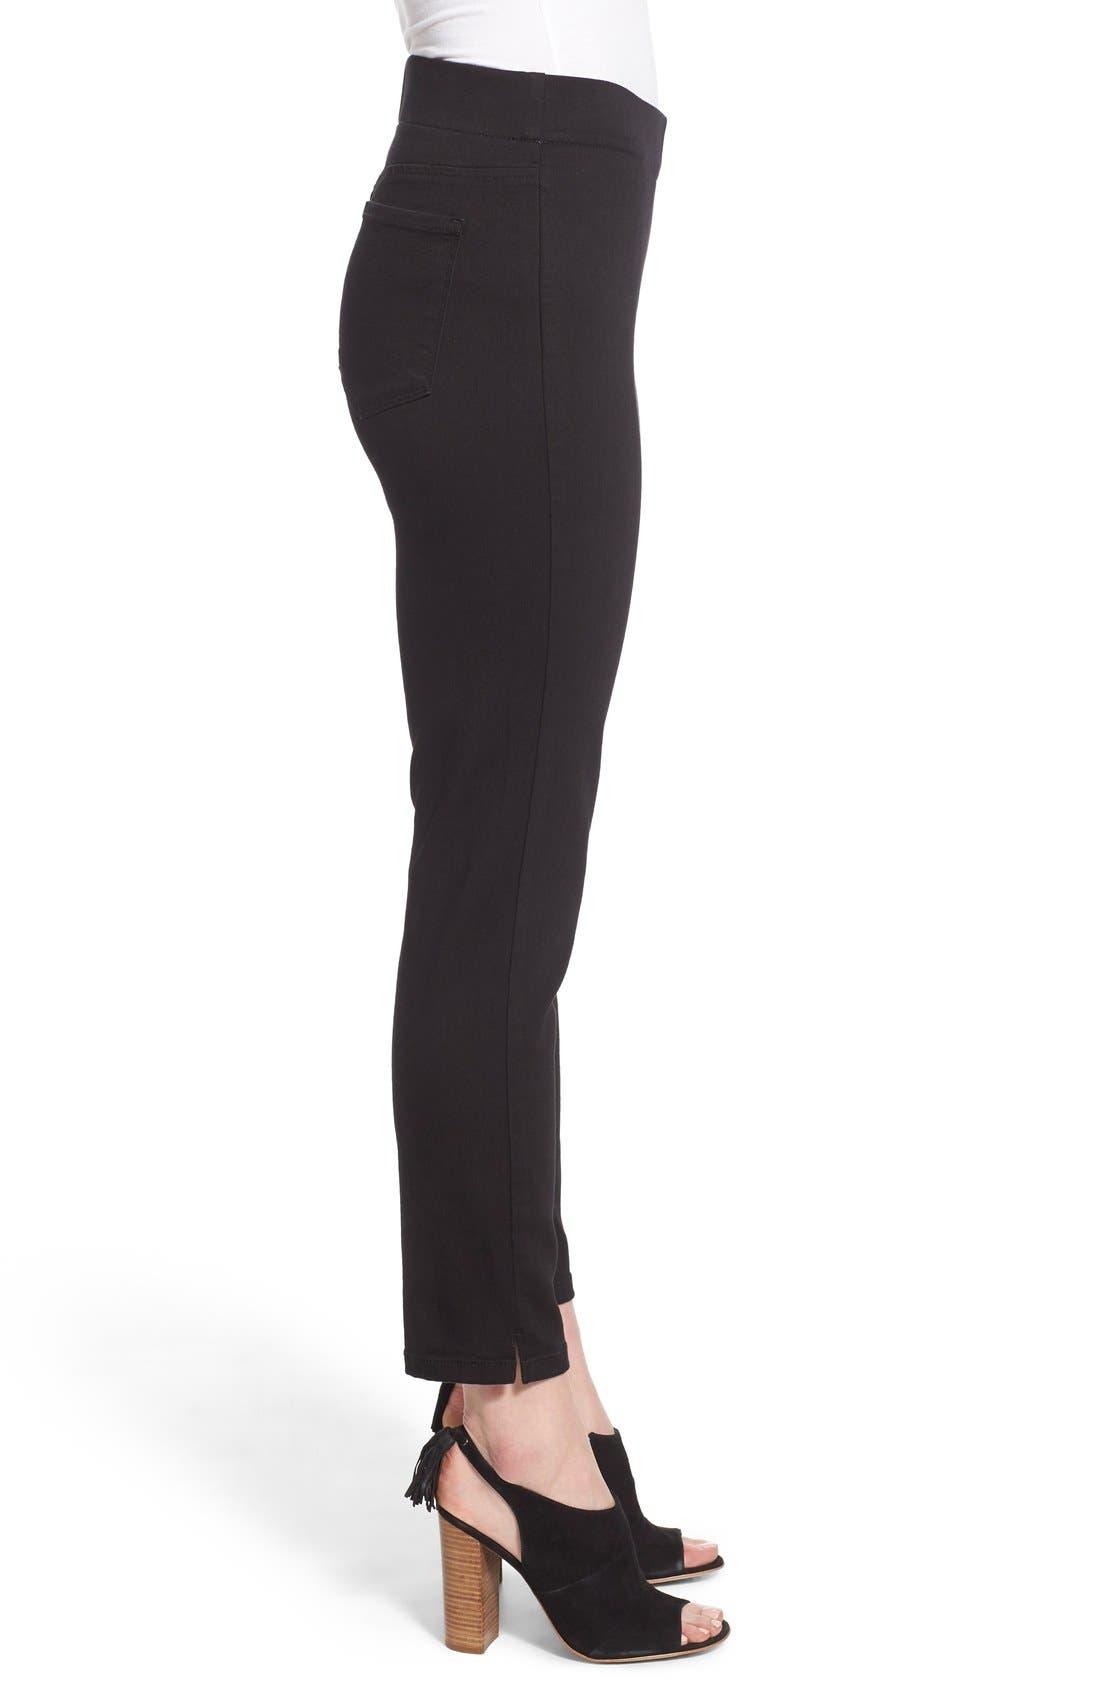 Alternate Image 3  - NYDJ Millie Pull-On Stretch Ankle Skinny Jeans (Regular & Petite)